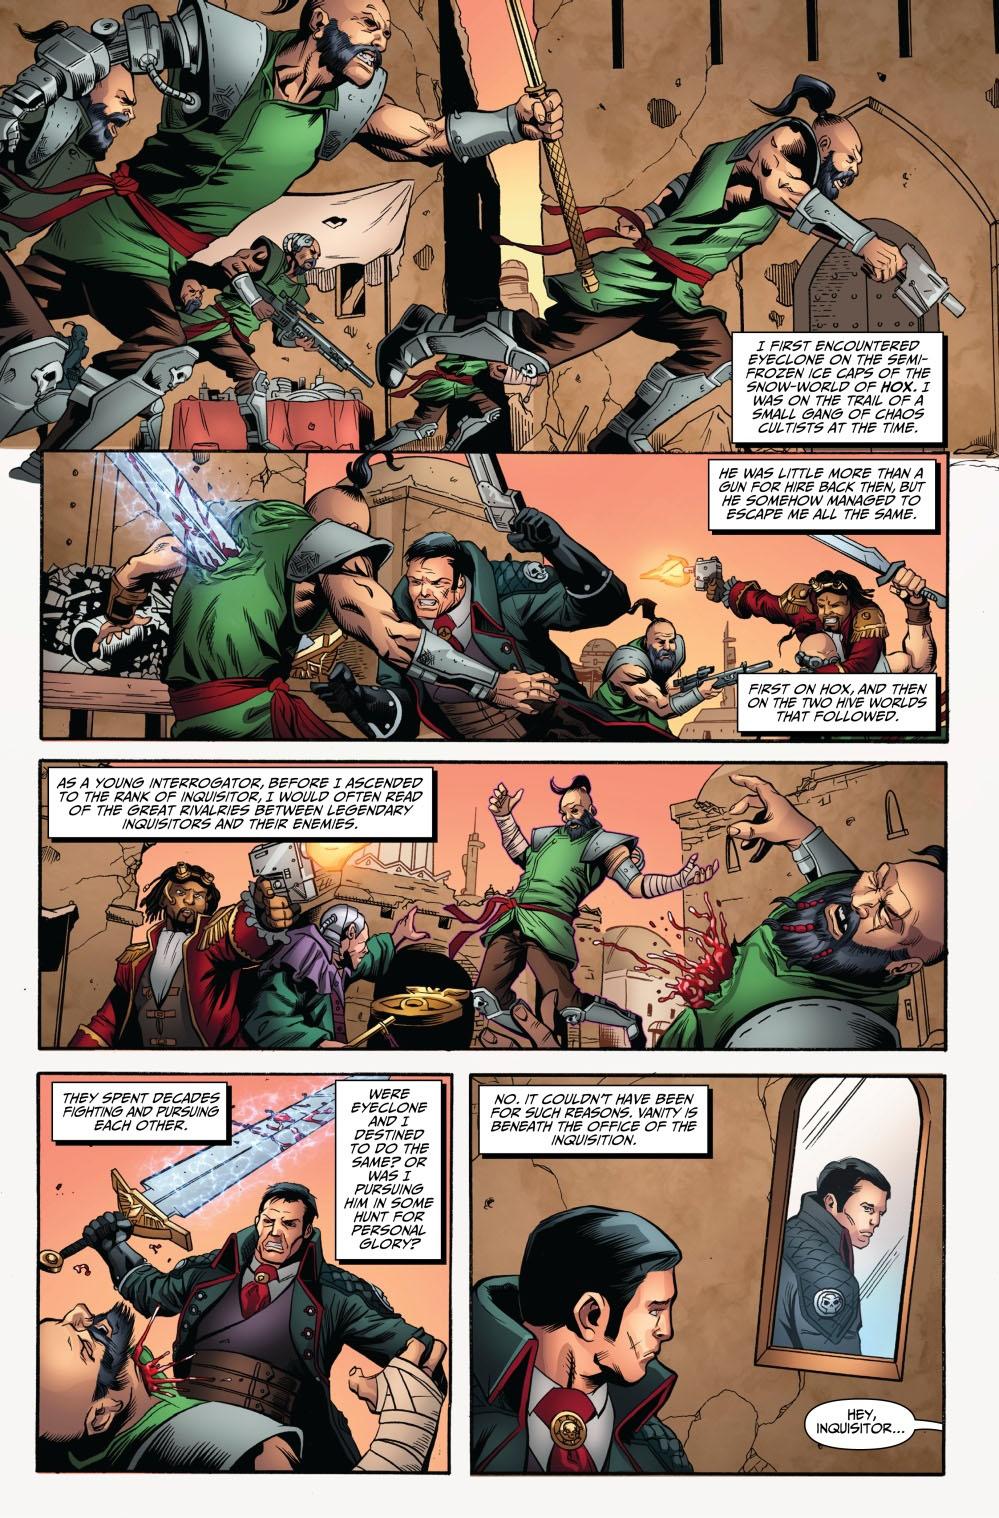 eisenhorn page 3